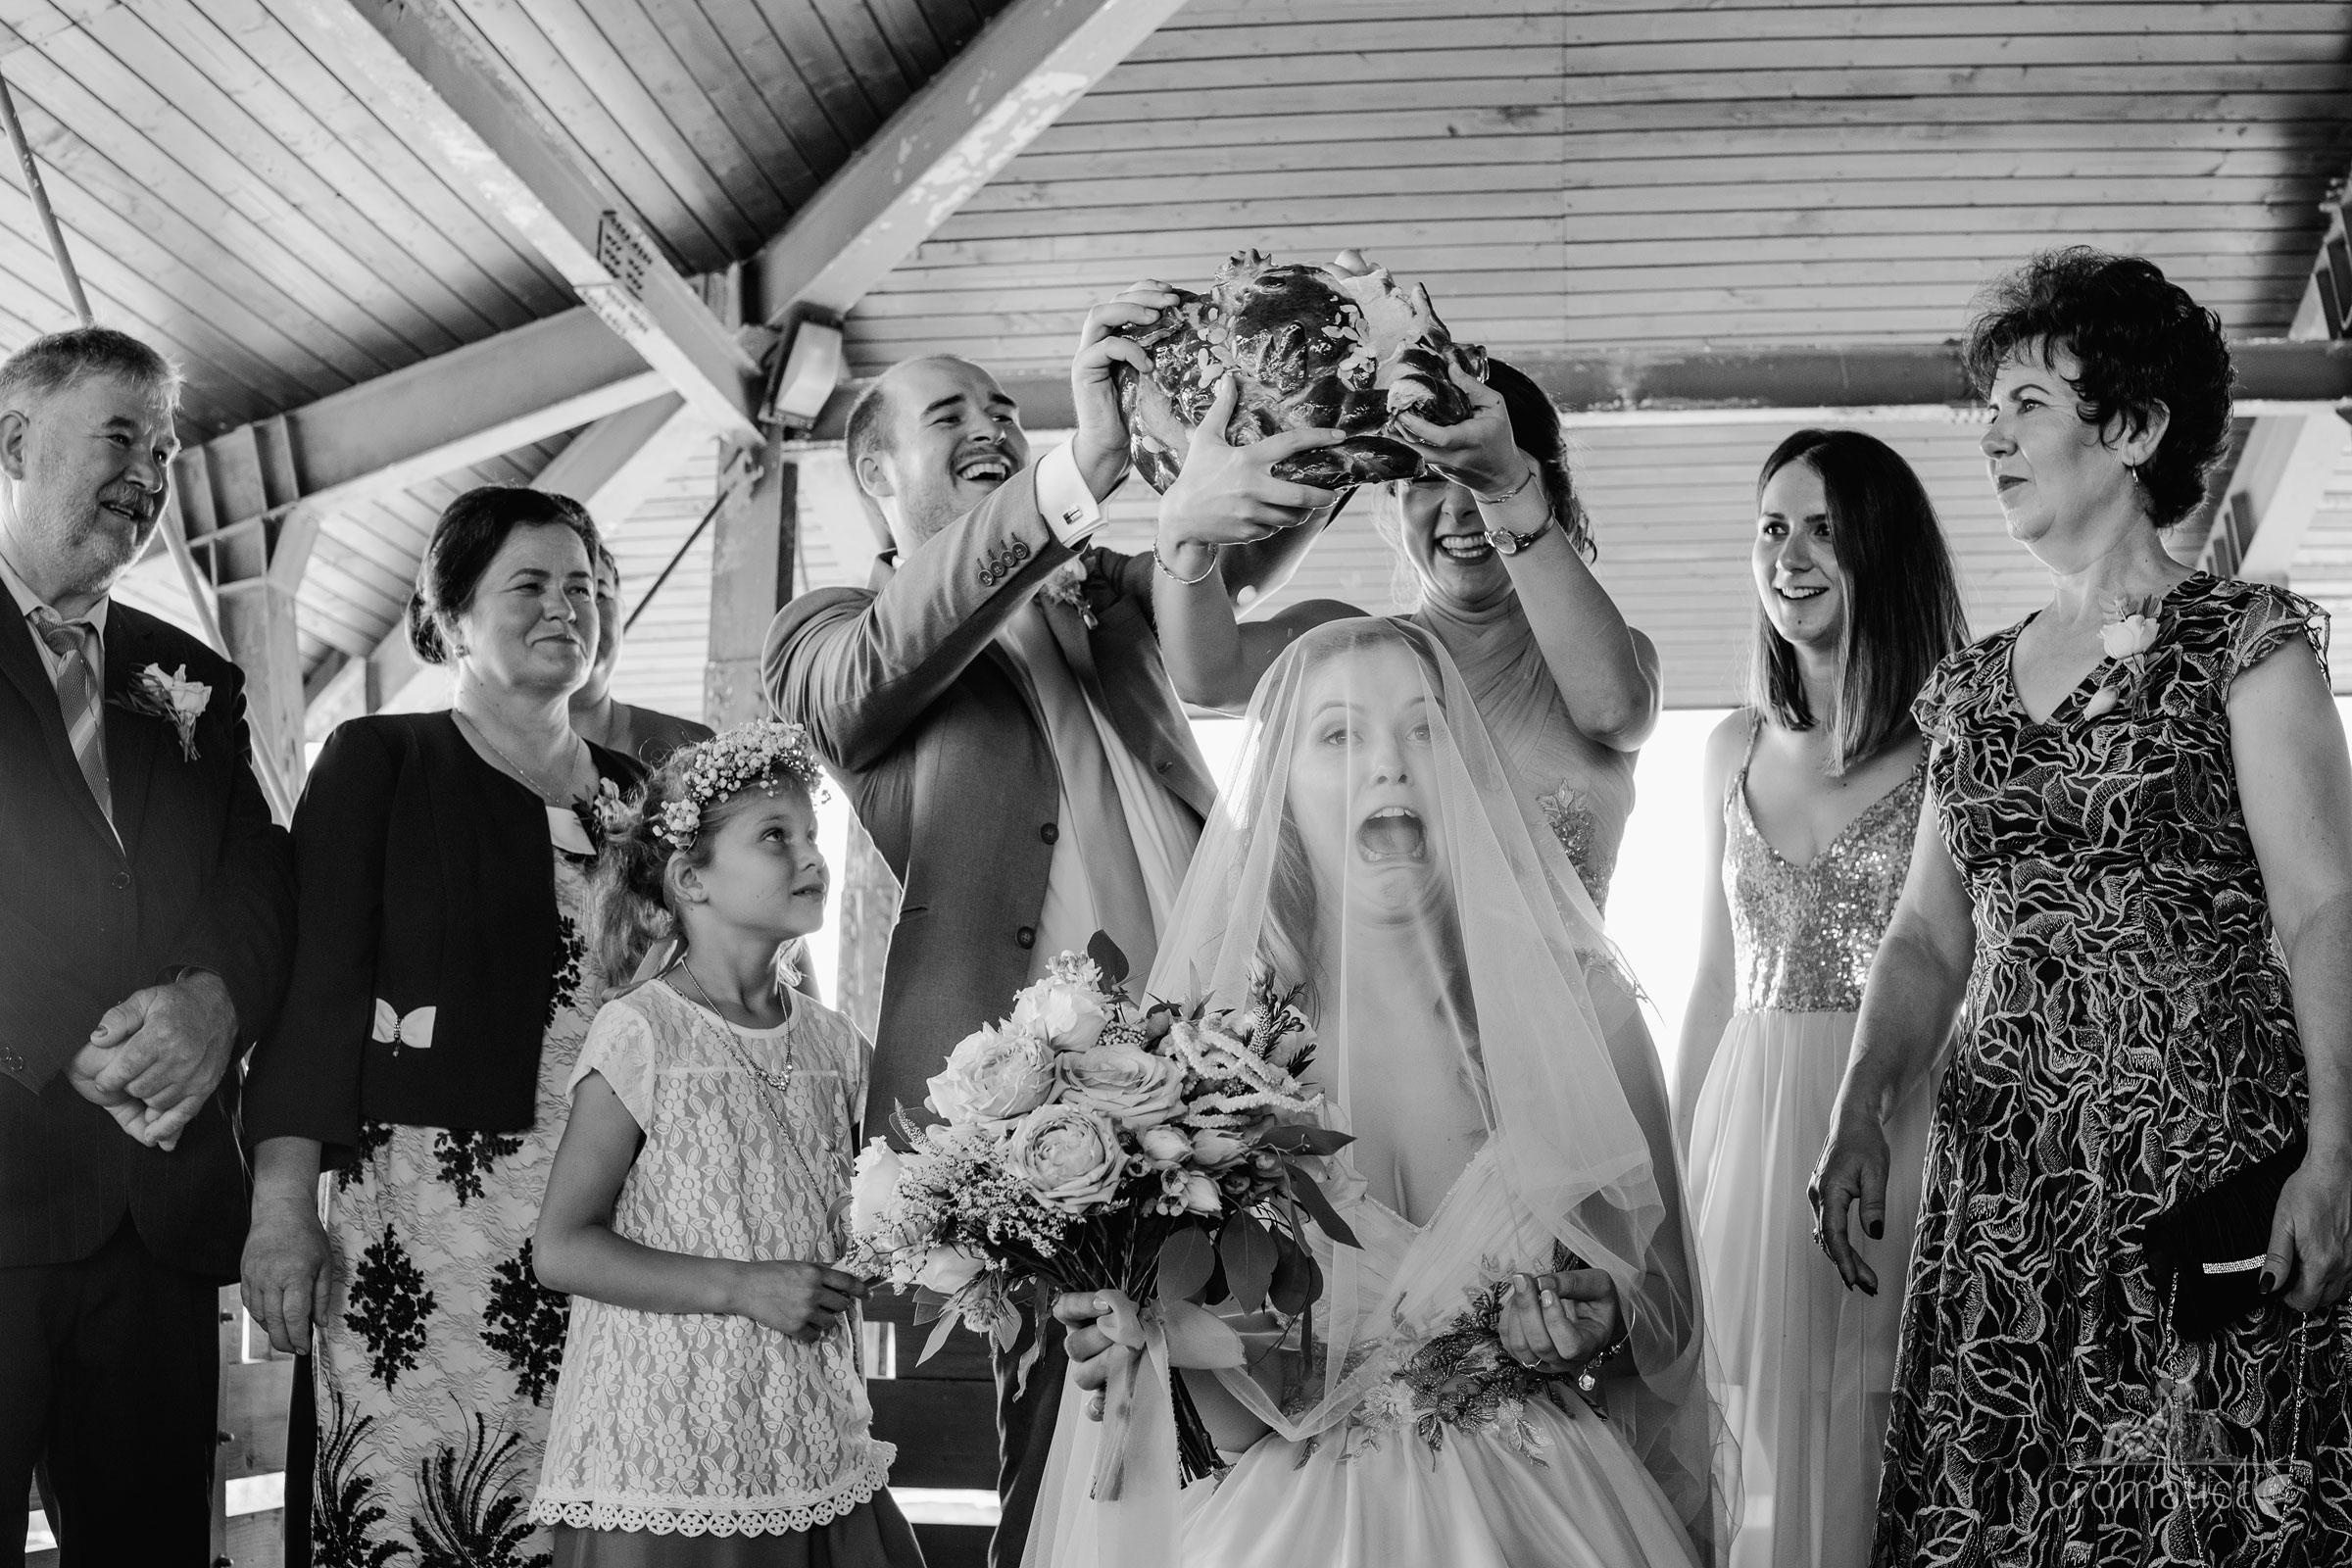 alexandra george fotografii nunta casa vlasia 045